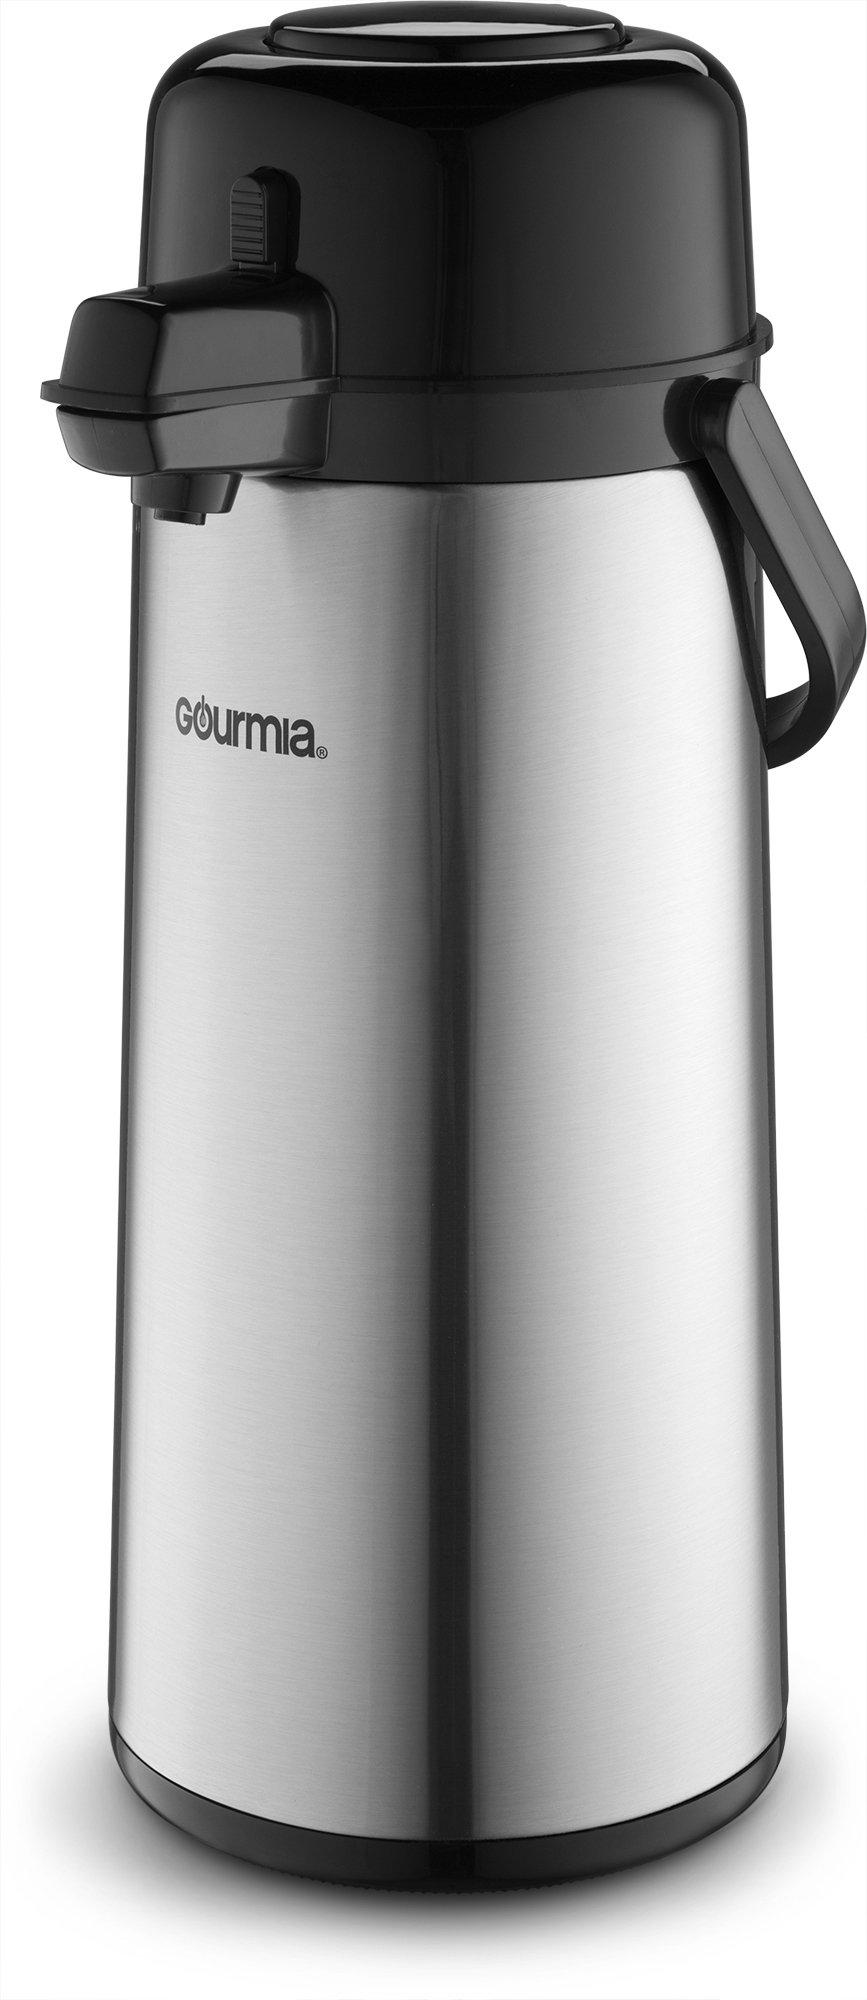 Gourmia GAP9820 Airpot Thermal Hot & Cold Beverage Carafe With Pump Dispenser 2.2L Capacity